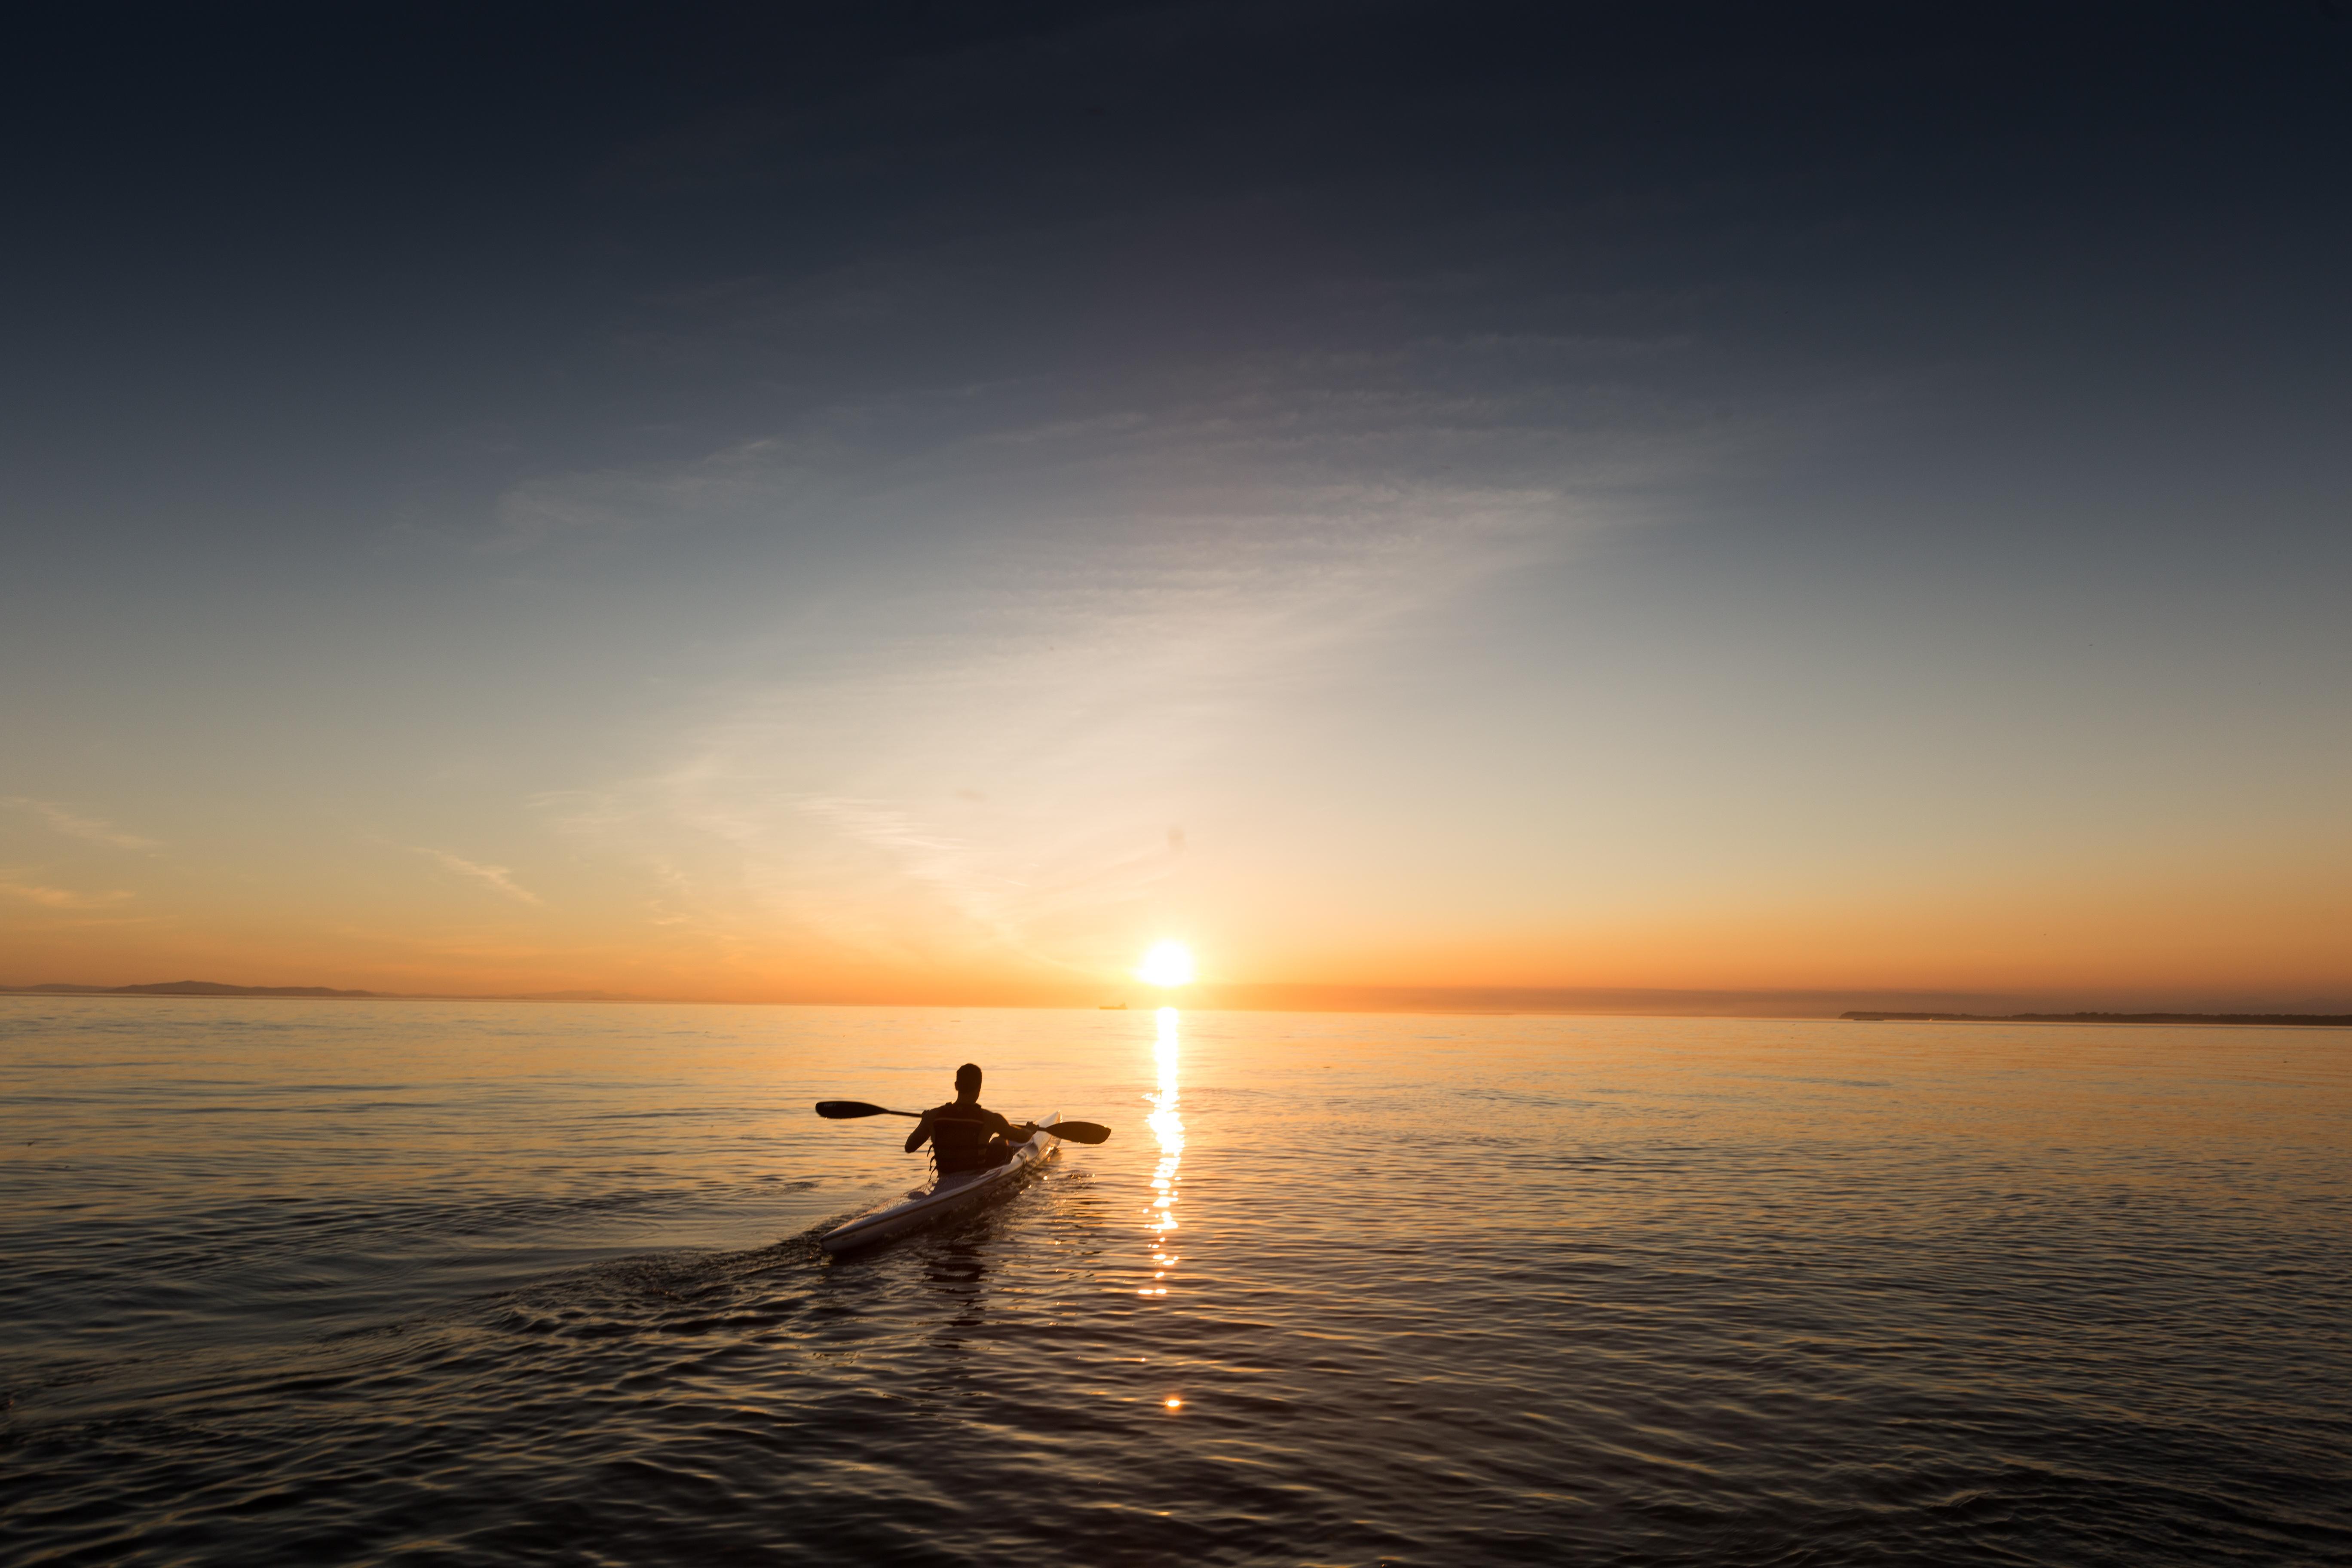 Pasear en kayak